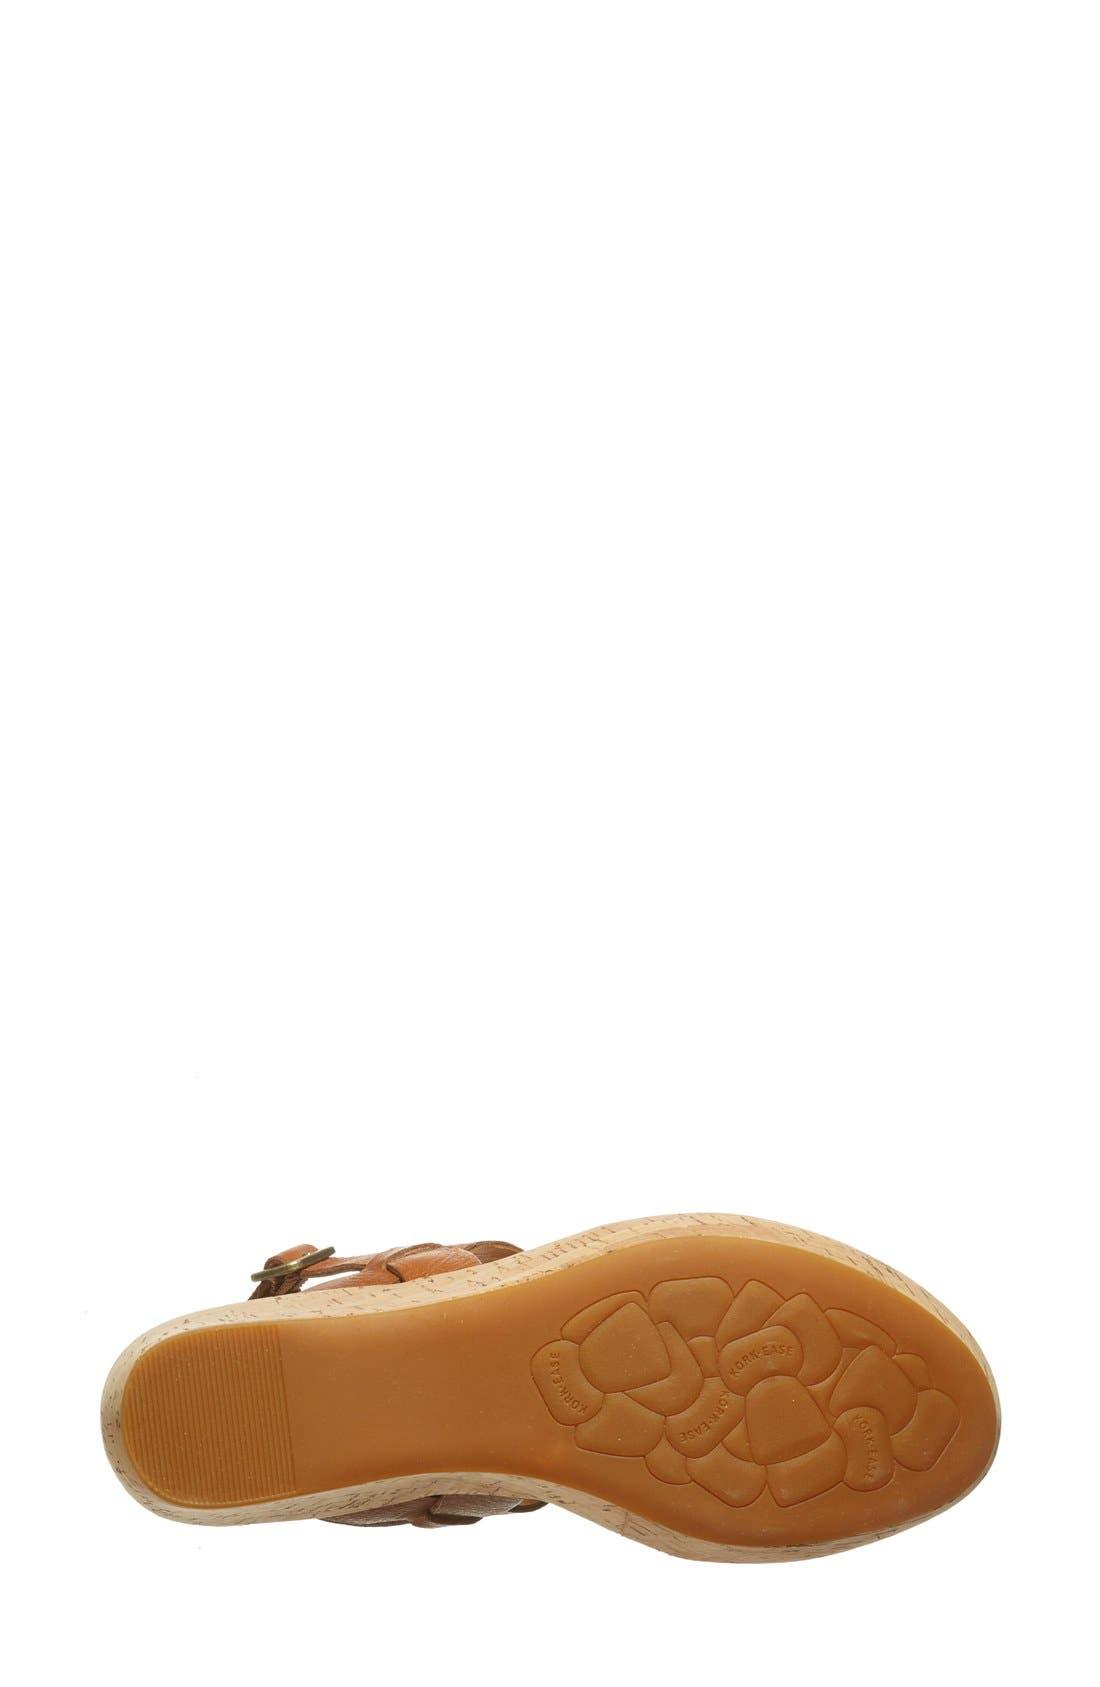 'Austin' Slingback Wedge Sandal,                             Alternate thumbnail 39, color,